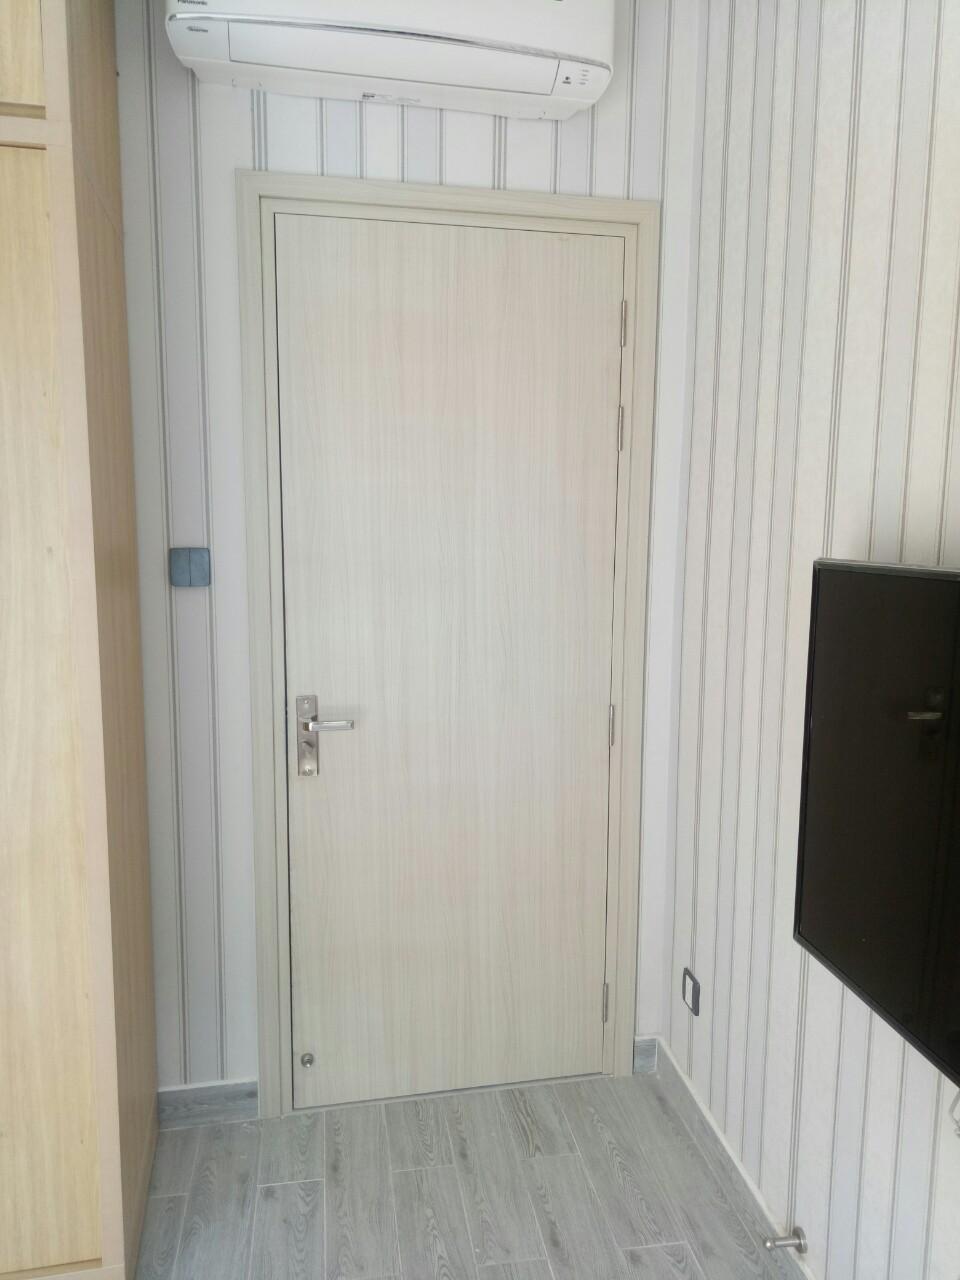 Giá cửa nhựa gỗ Composite tại Cam Lâm